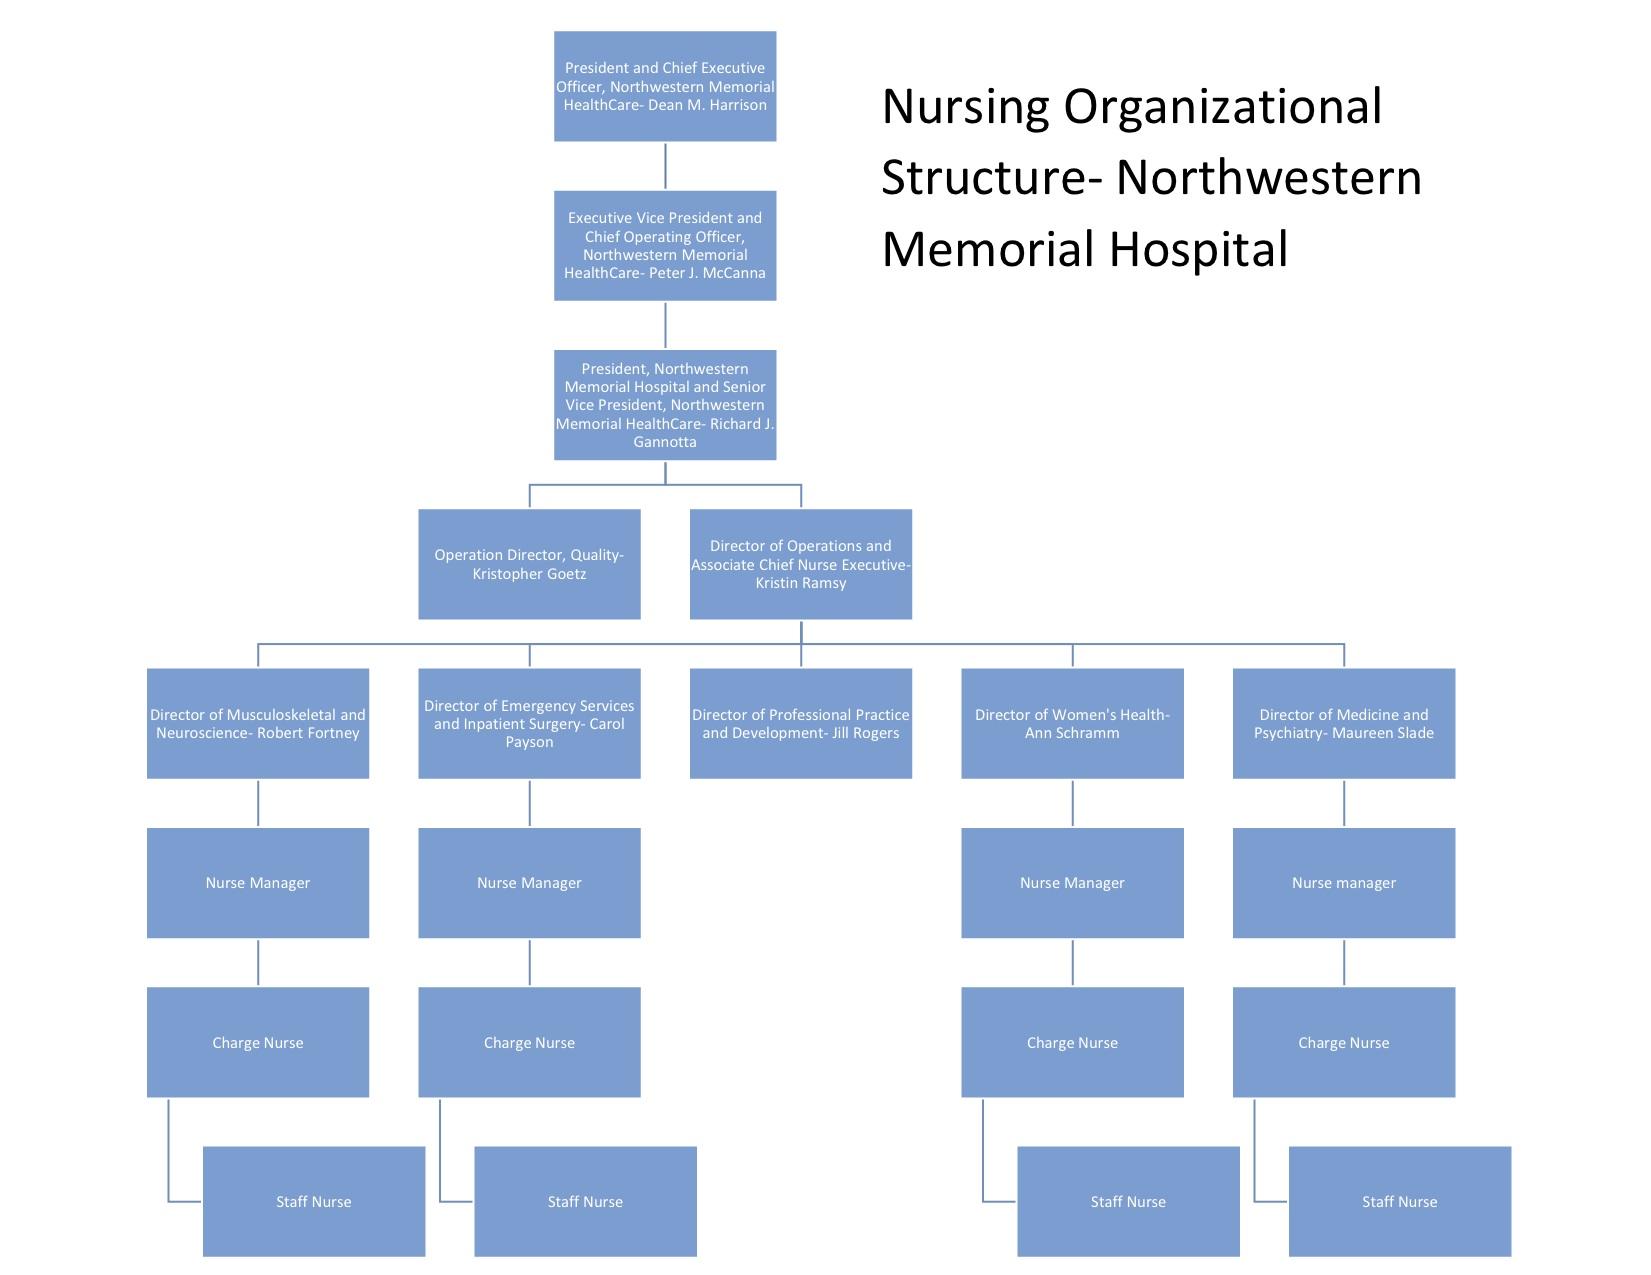 Structuralysis Of Northwestern Memorial Hospital Chicago Illinois